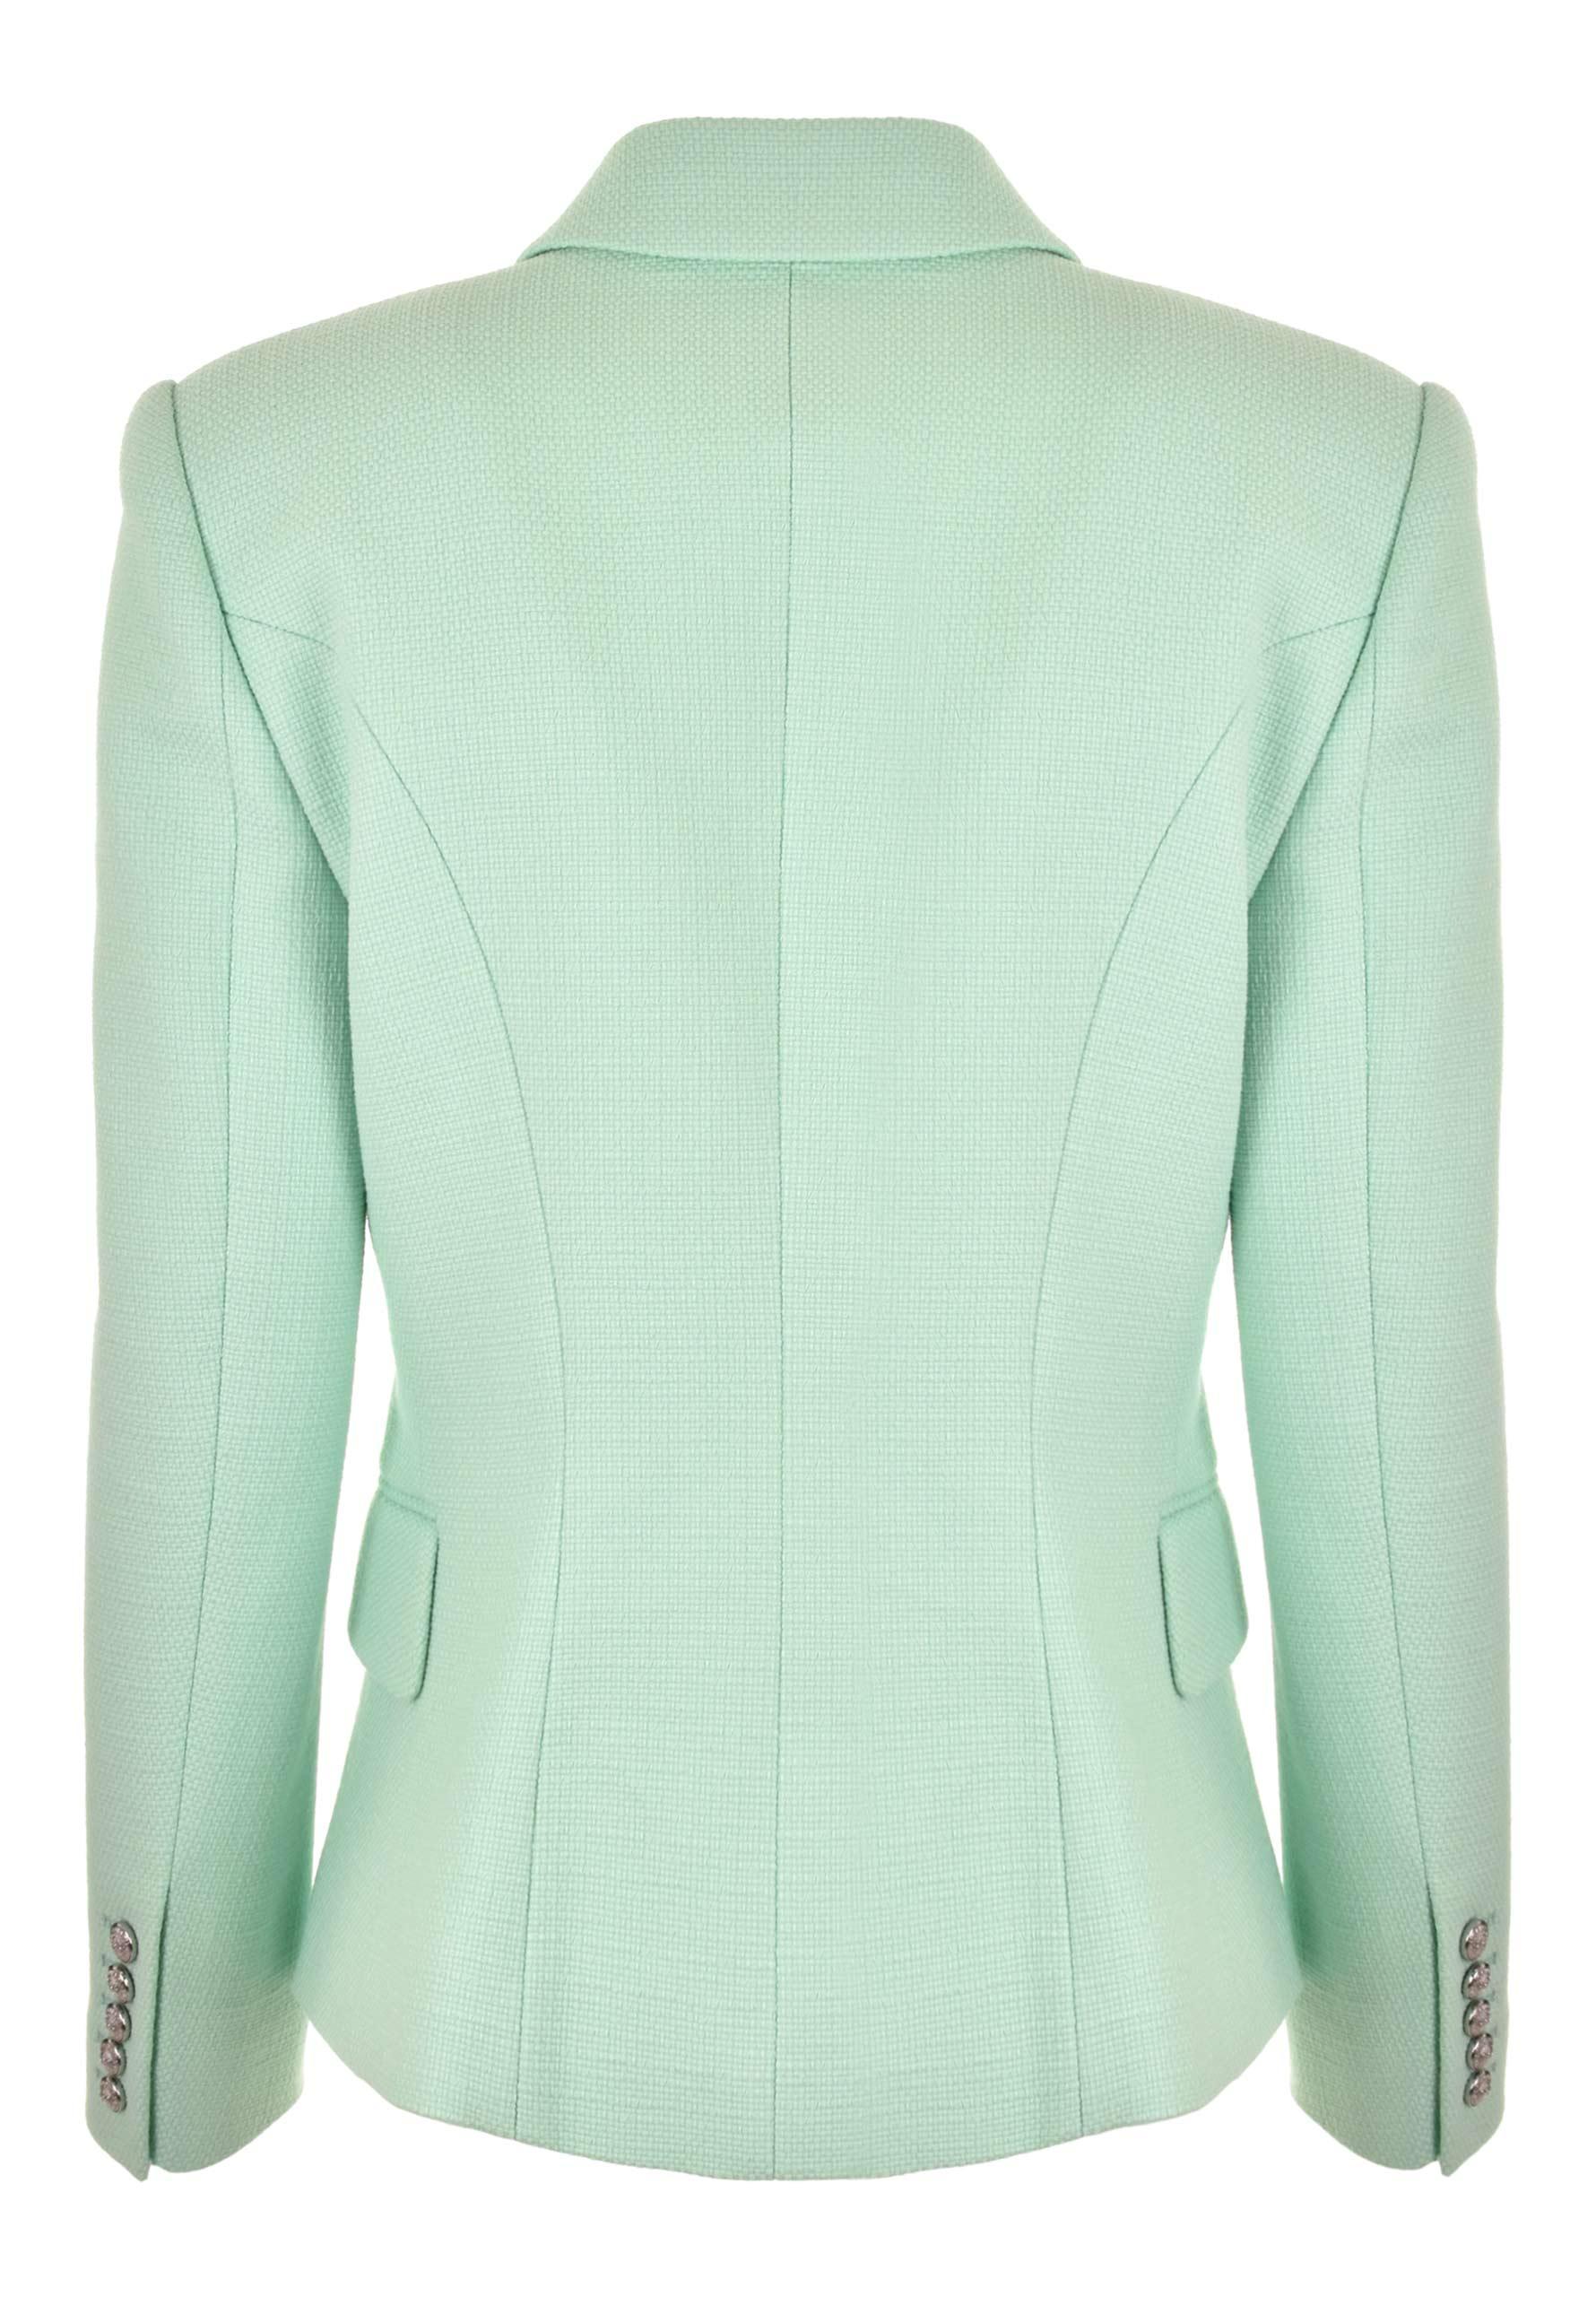 6b8bb3ee Balmain - Green Double Breasted 6 Button Jacket Mint/silver - Lyst. View  fullscreen